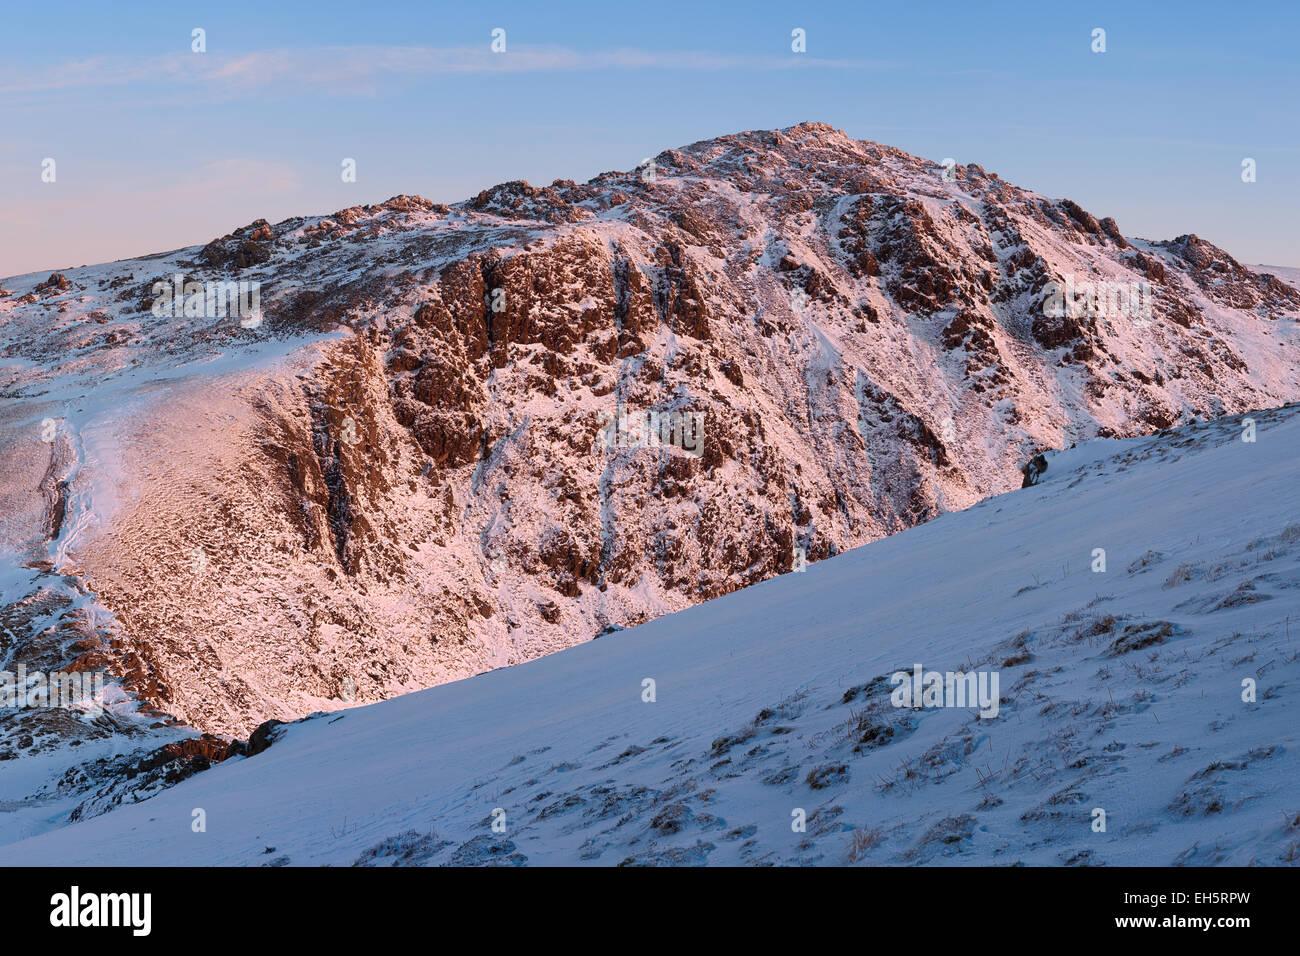 The summit of Cadair Idris, Snowdonia national park, north Wales. Stock Photo